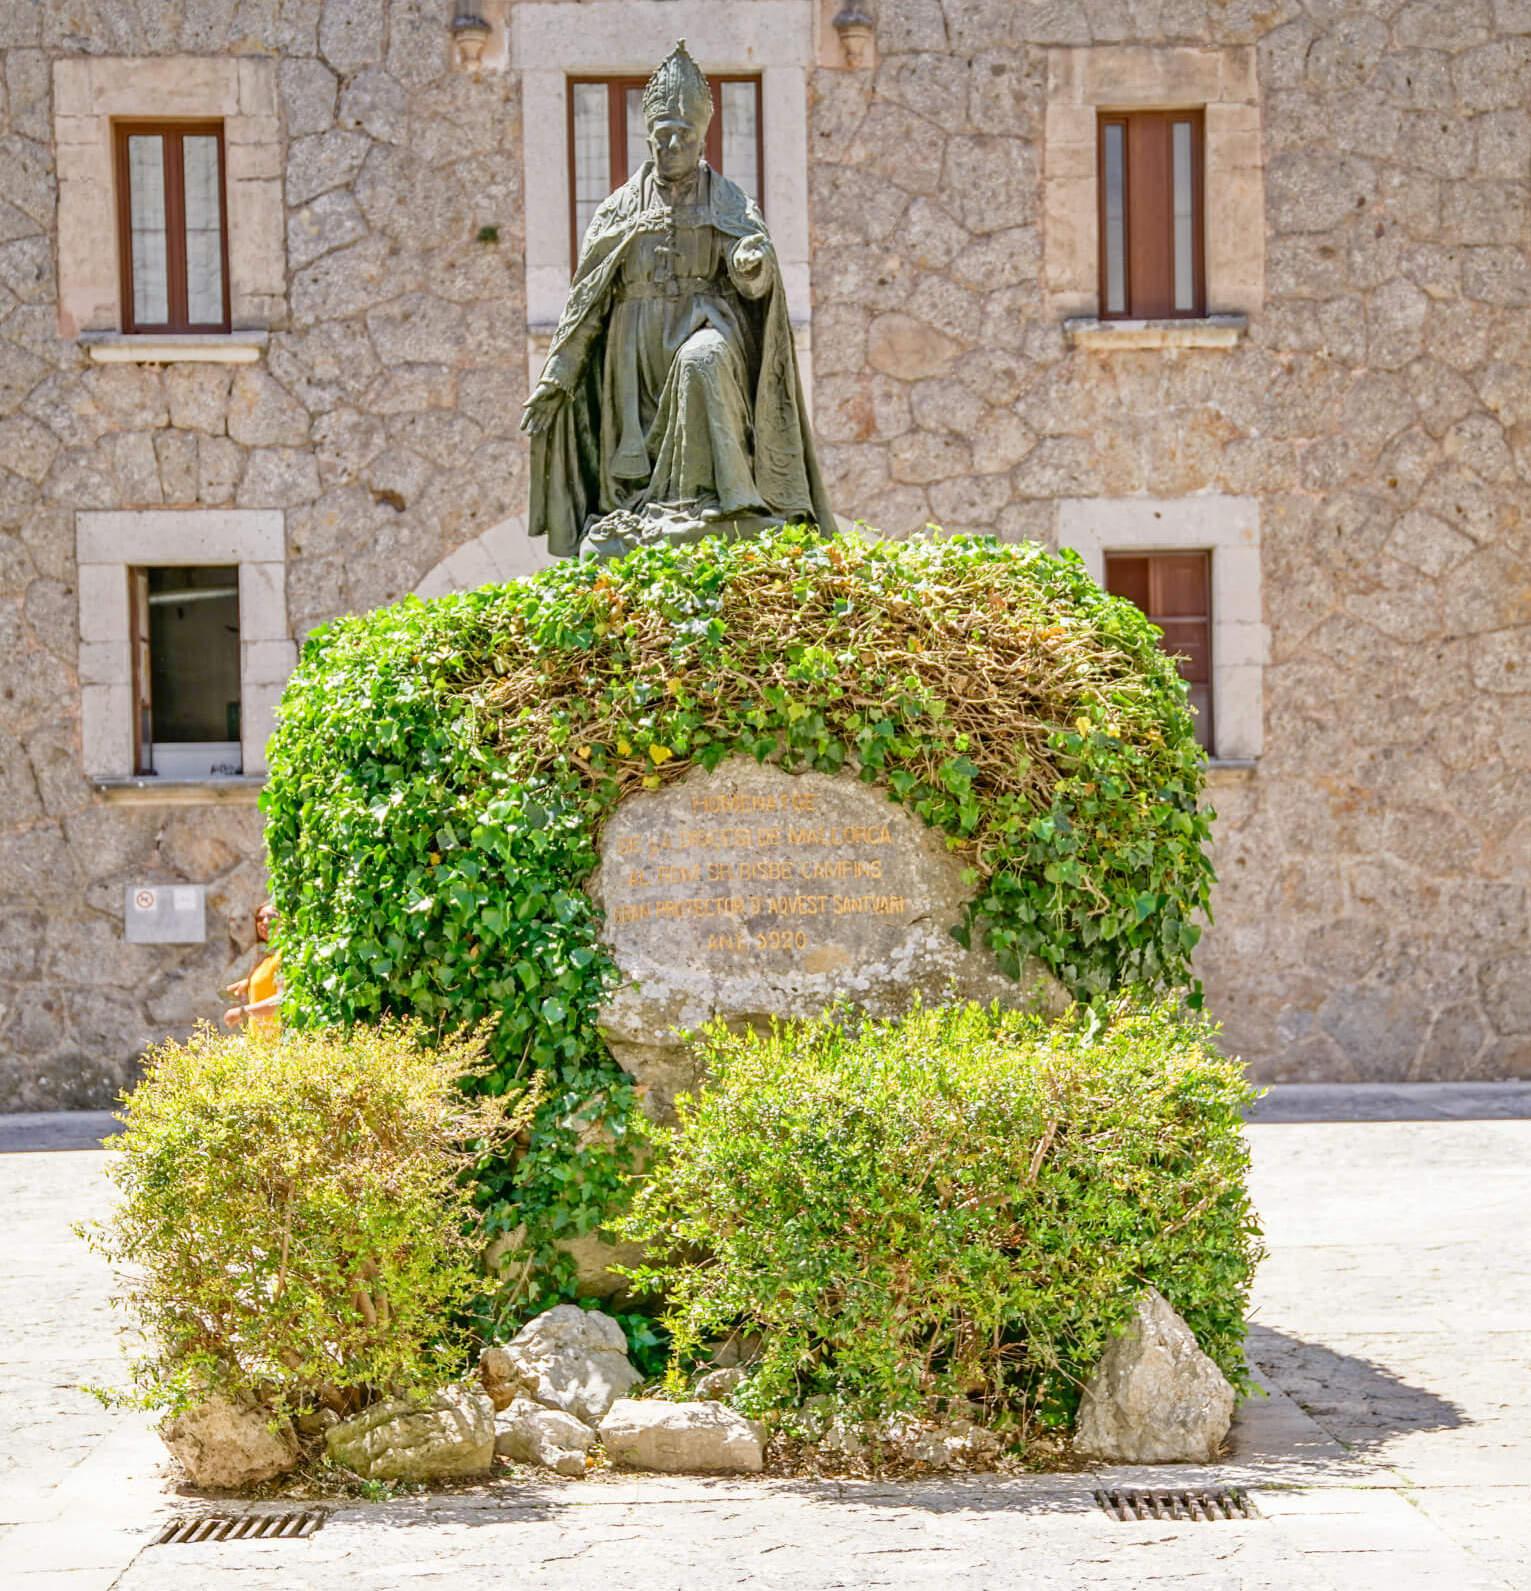 Bischof Pere-Joan Campins kloster lluc mallorca